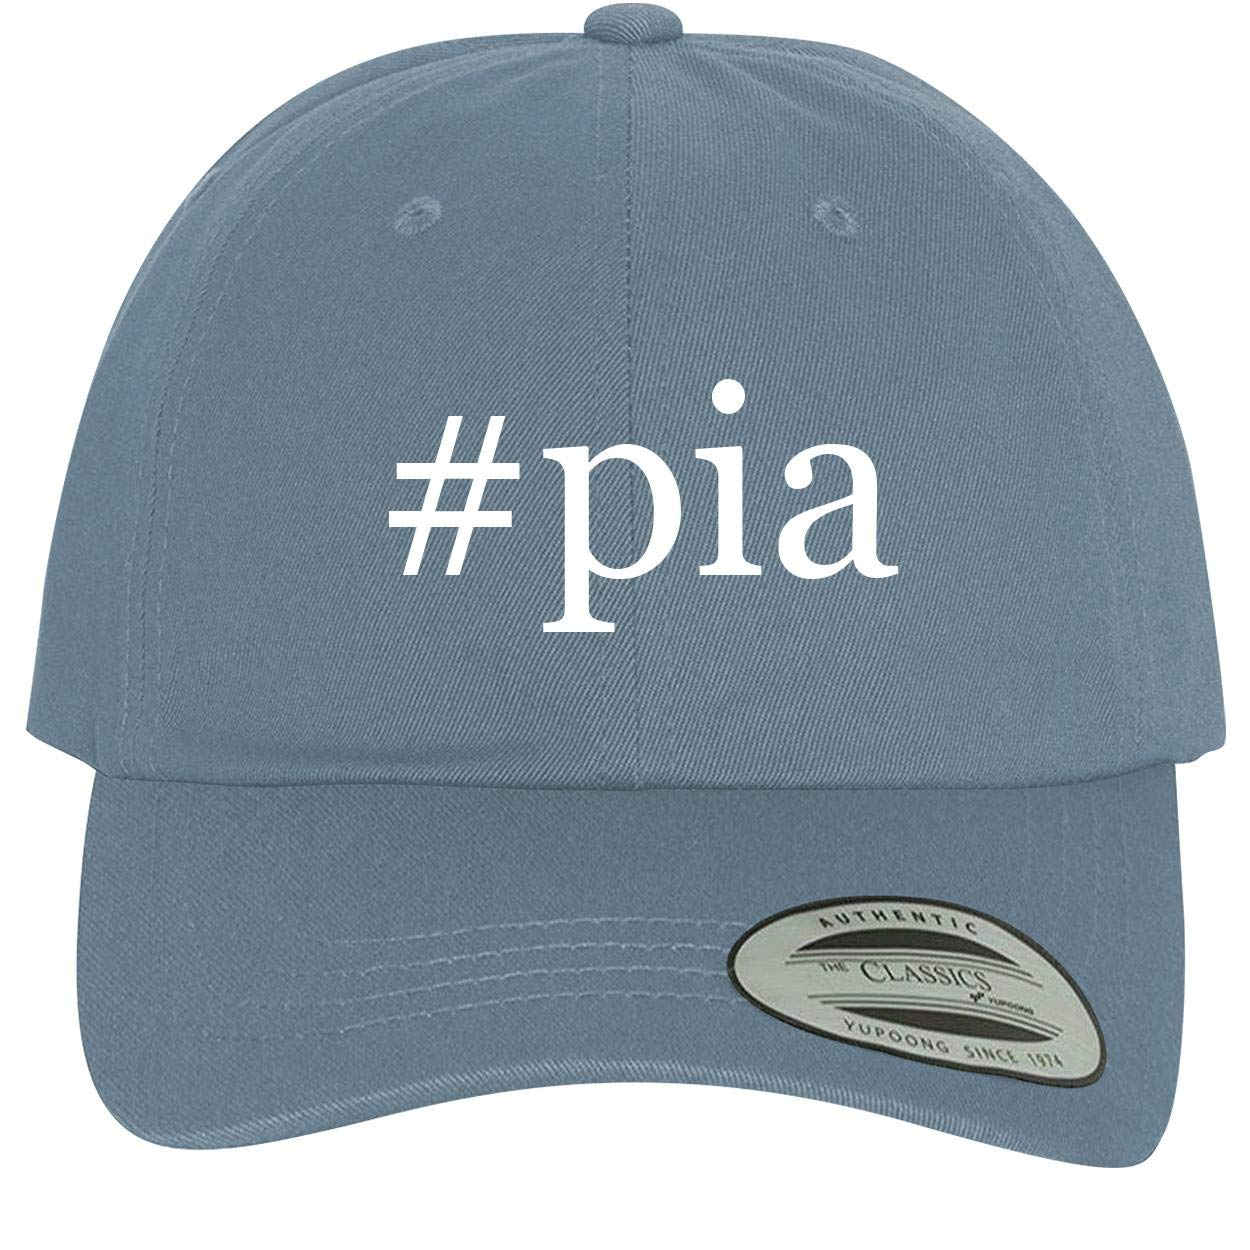 Comfortable Dad Hat Baseball Cap BH Cool Designs #pia